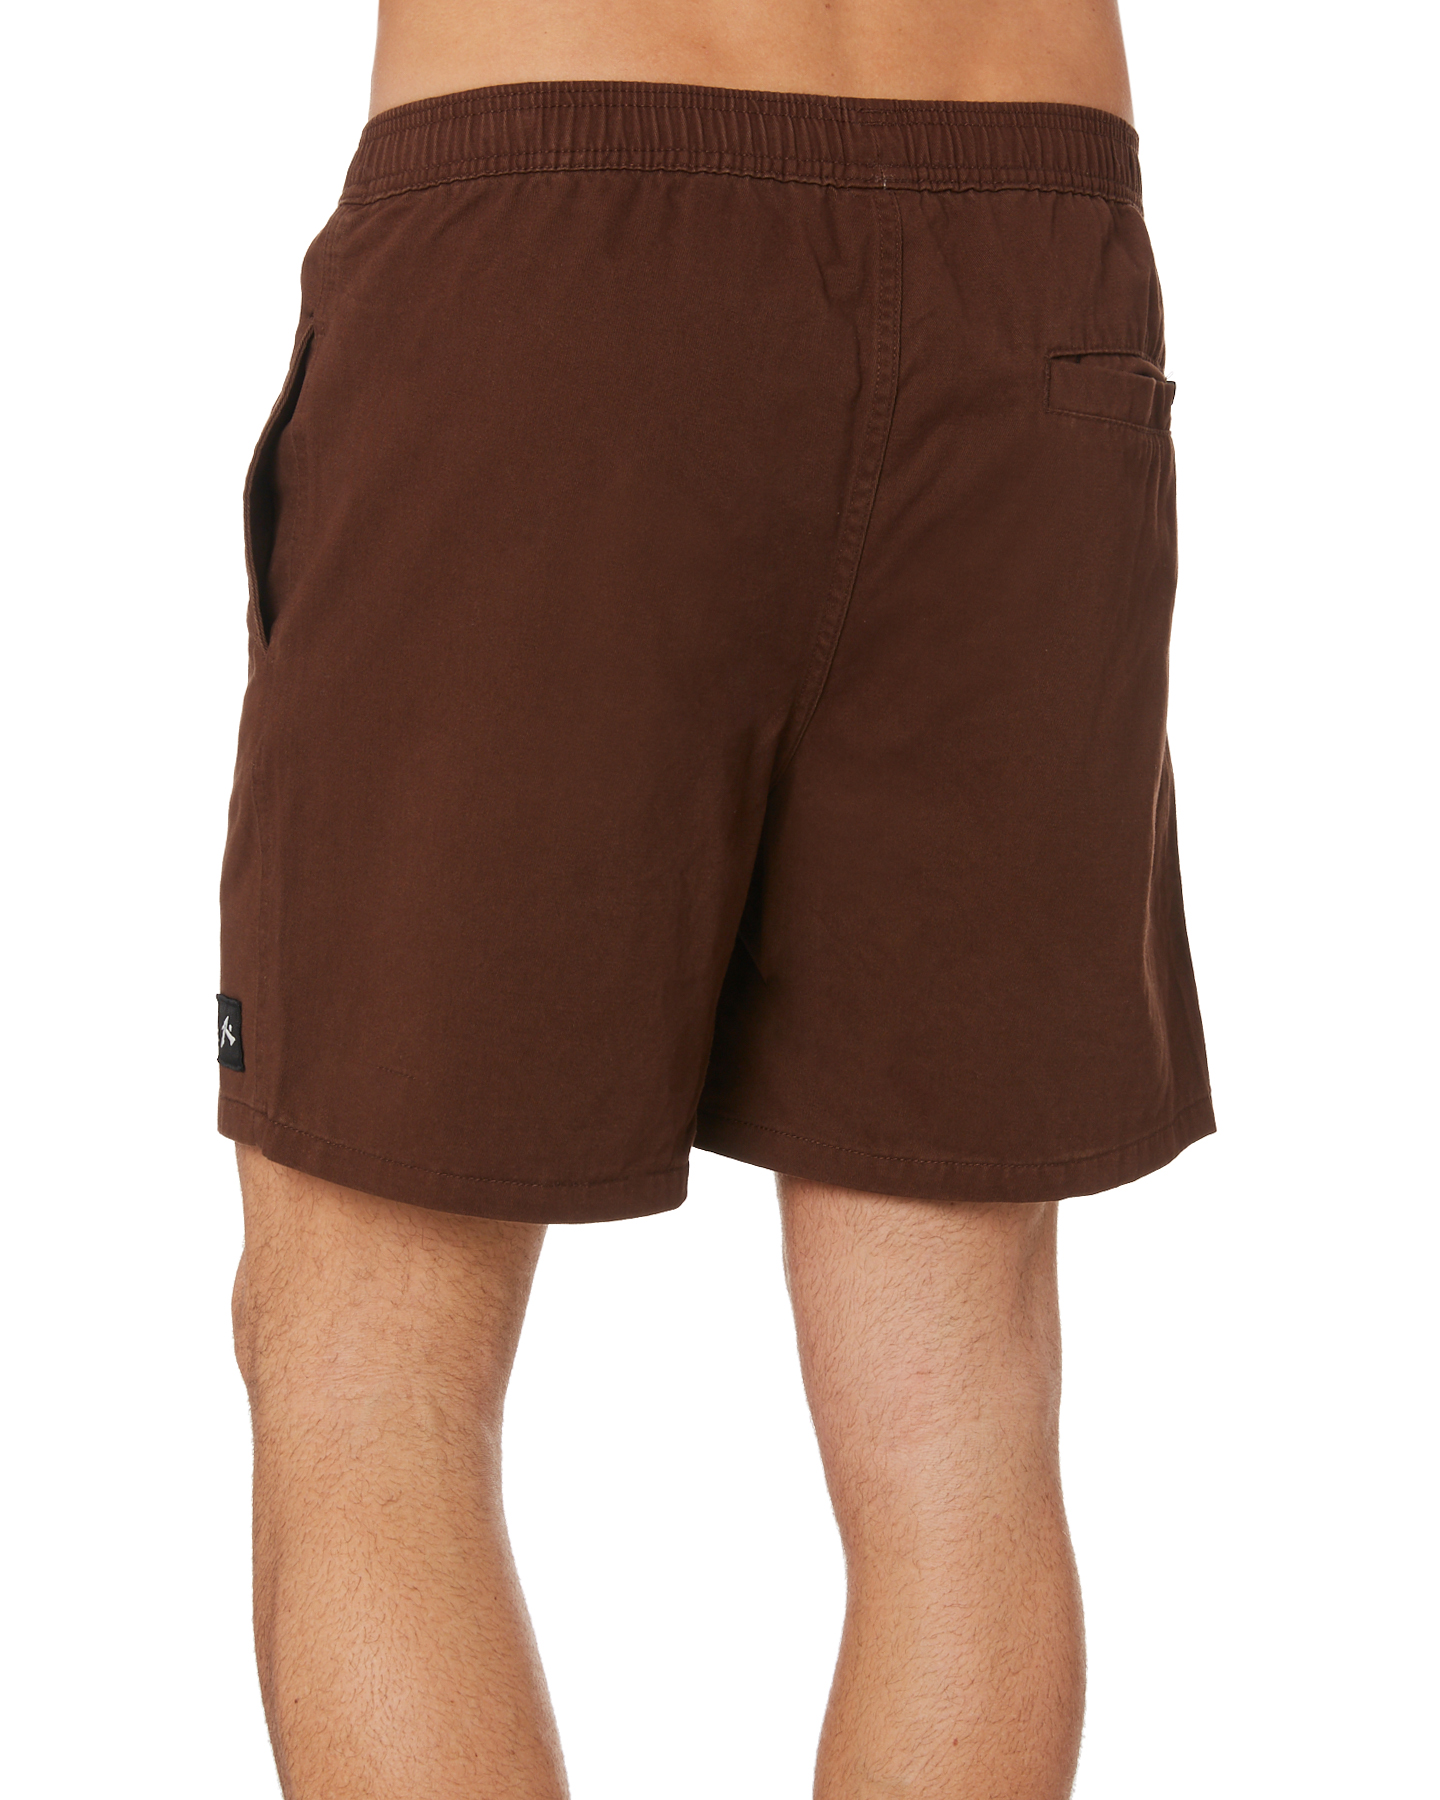 New-Rusty-Men-039-s-Hook-Elastic-Short-Cotton-Blue thumbnail 8